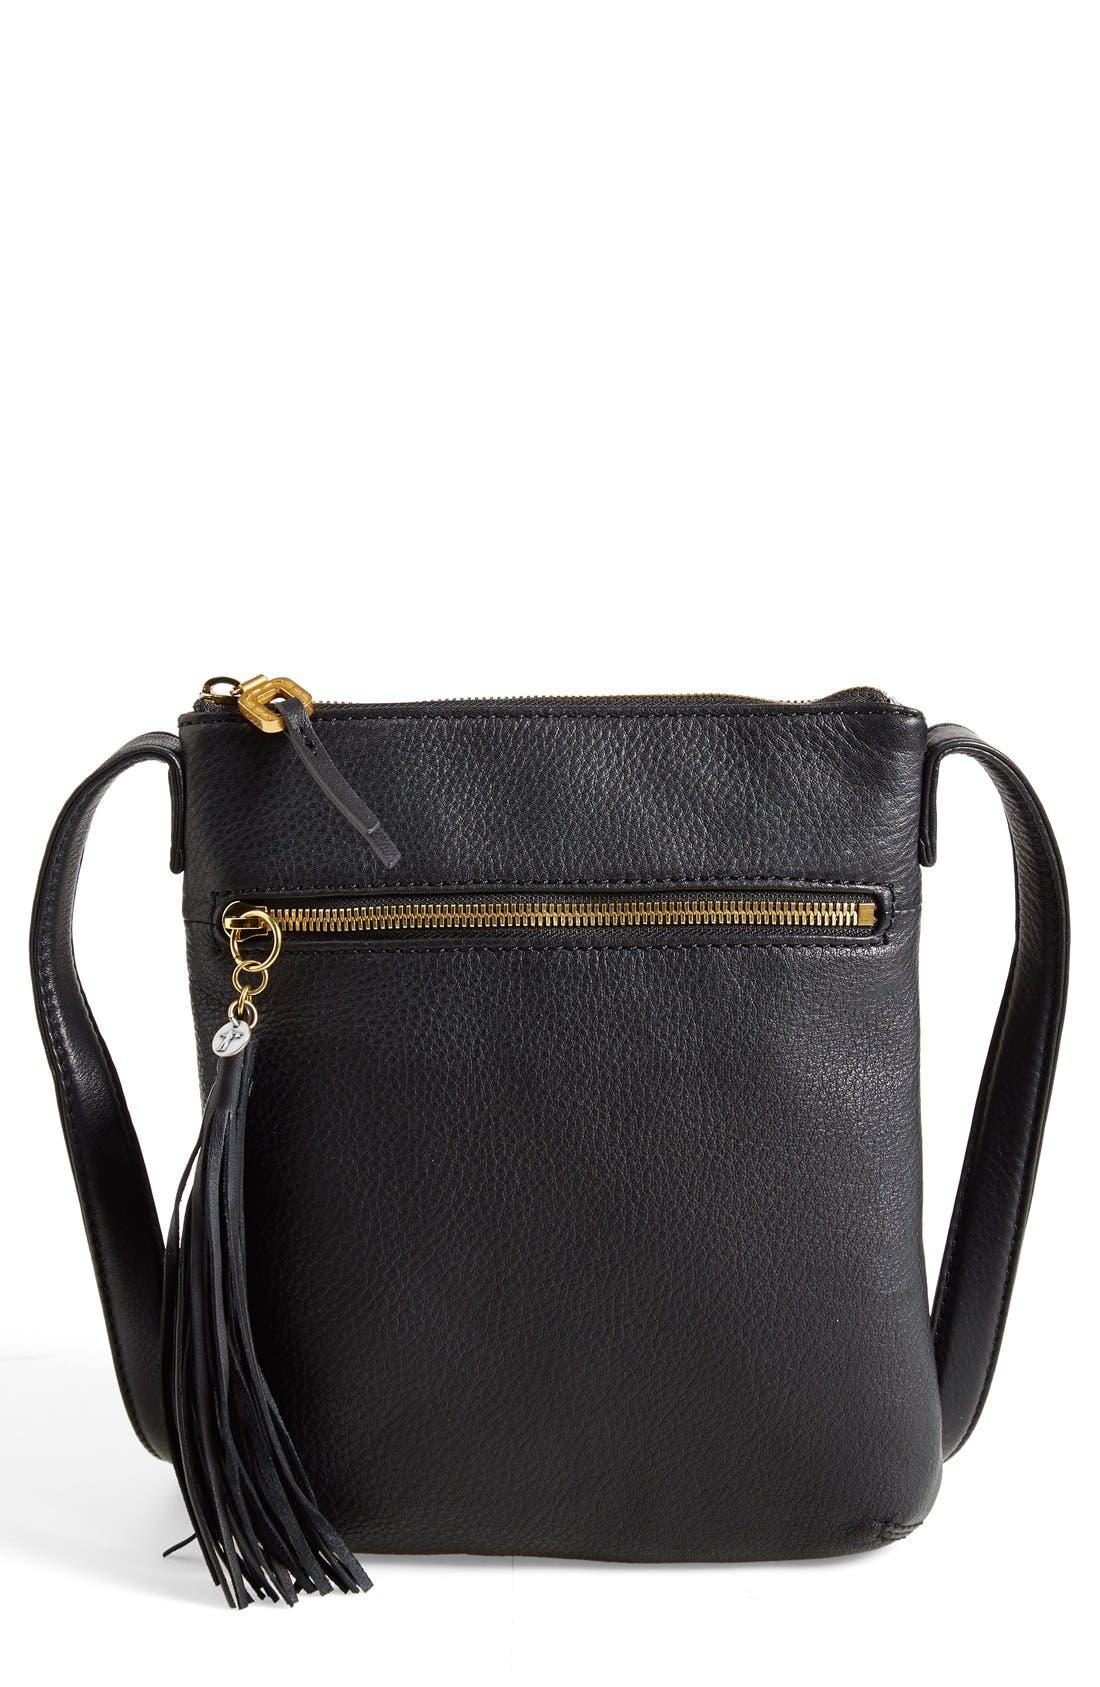 'Sarah' Leather Crossbody Bag,                             Main thumbnail 1, color,